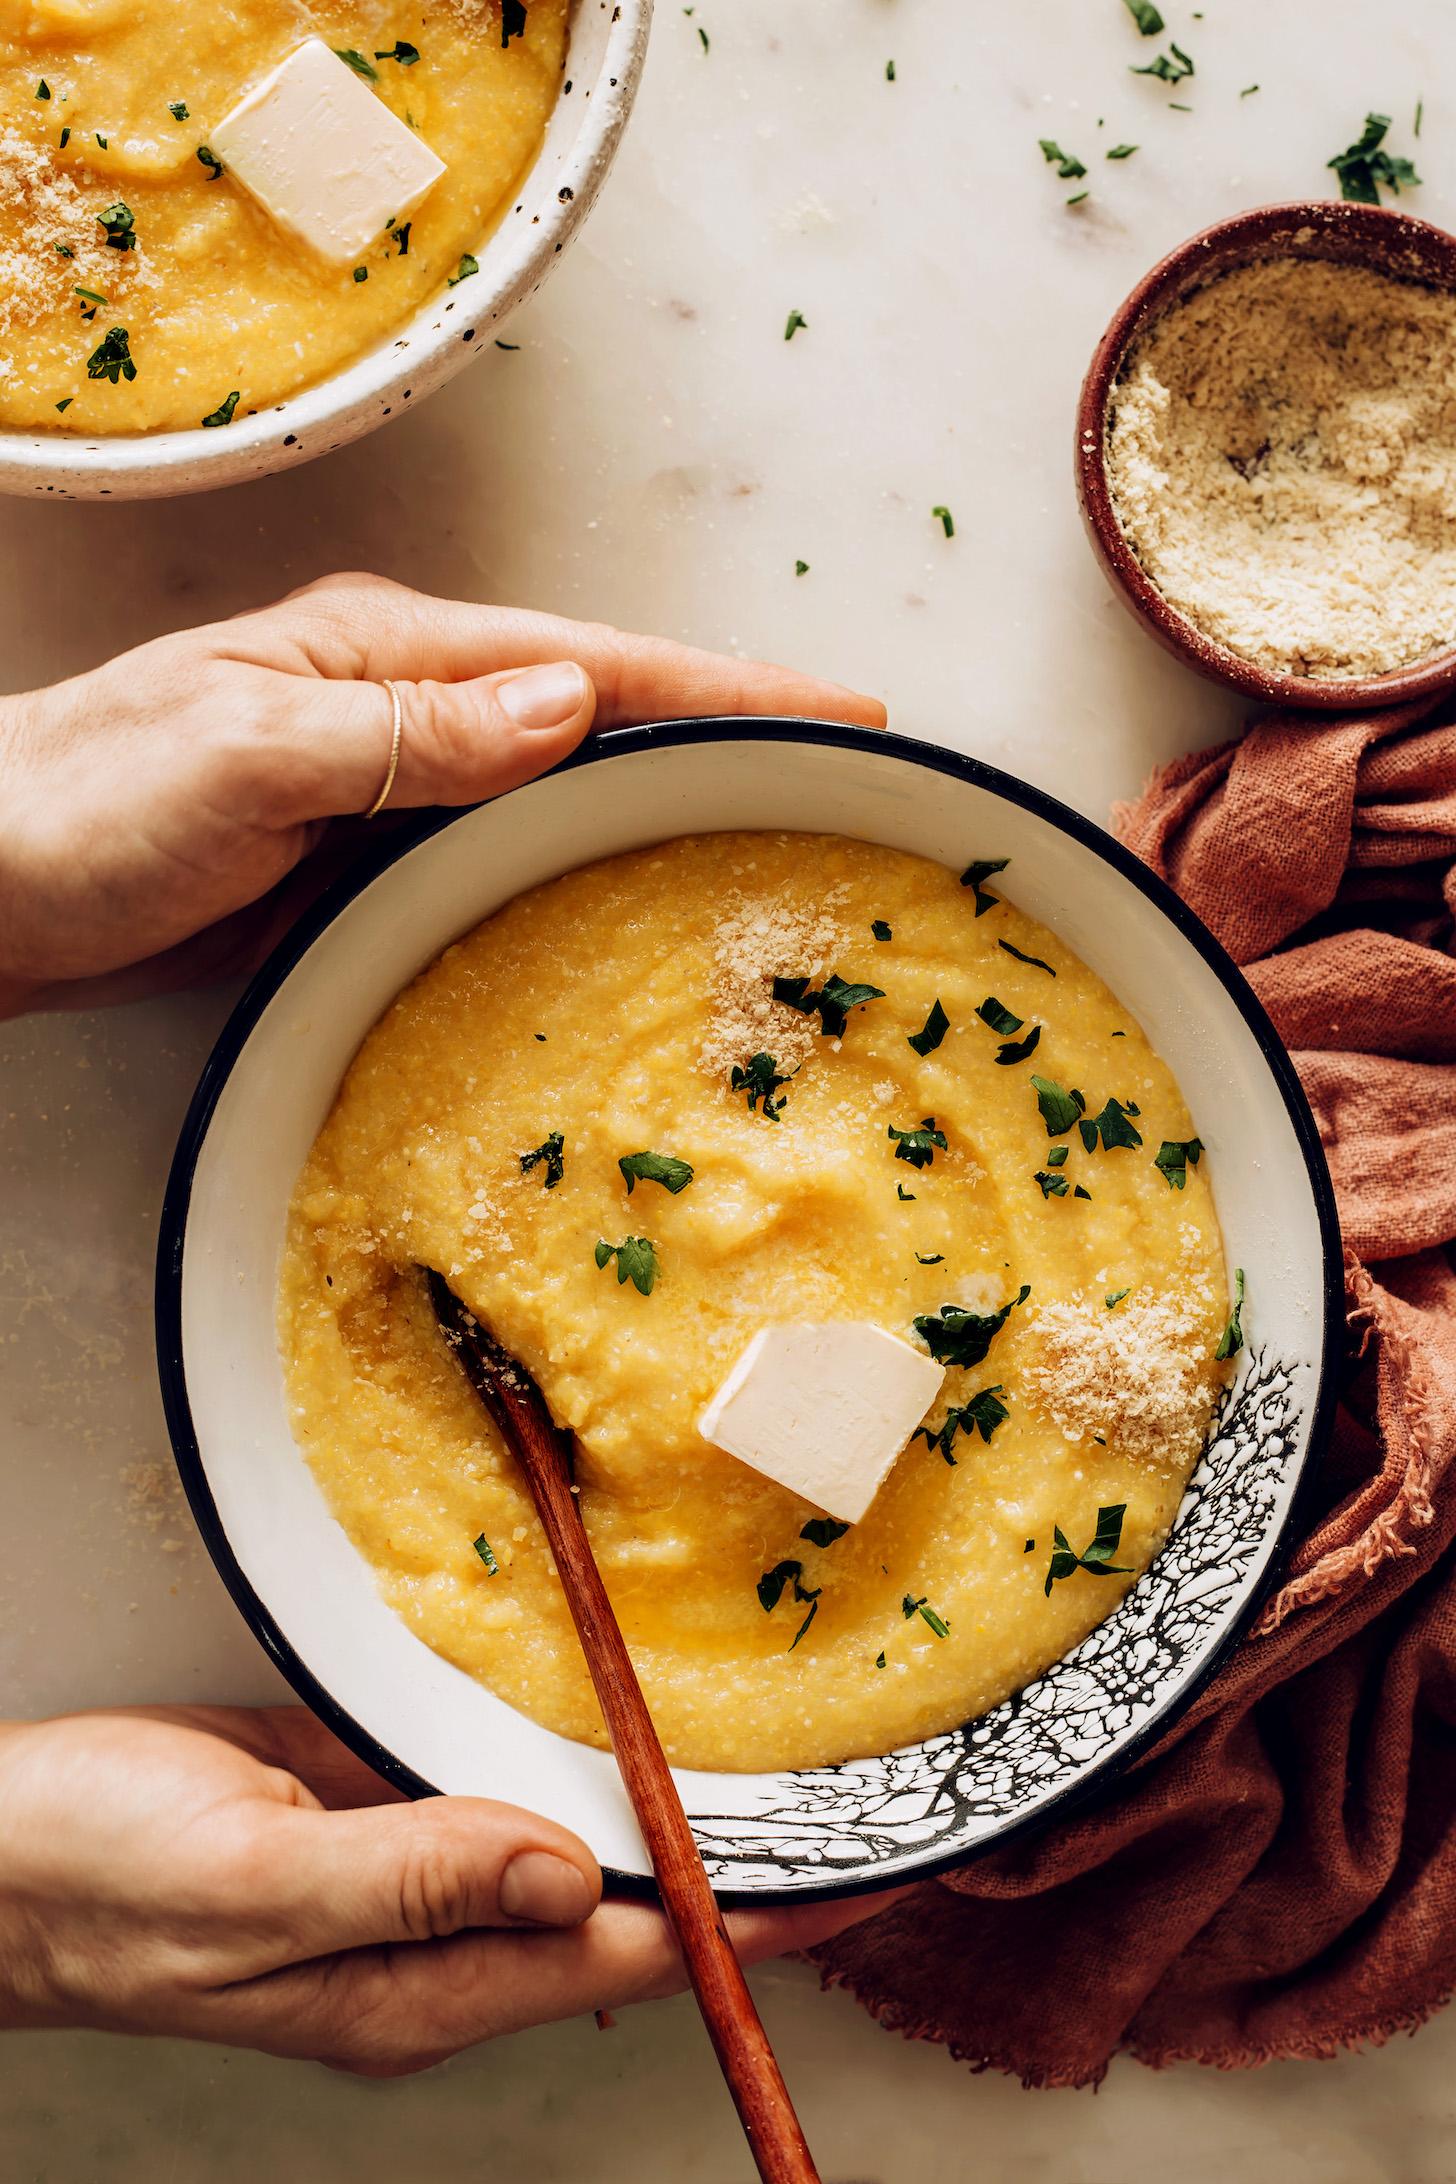 Bowl of vegan polenta with fresh herbs and vegan parmesan